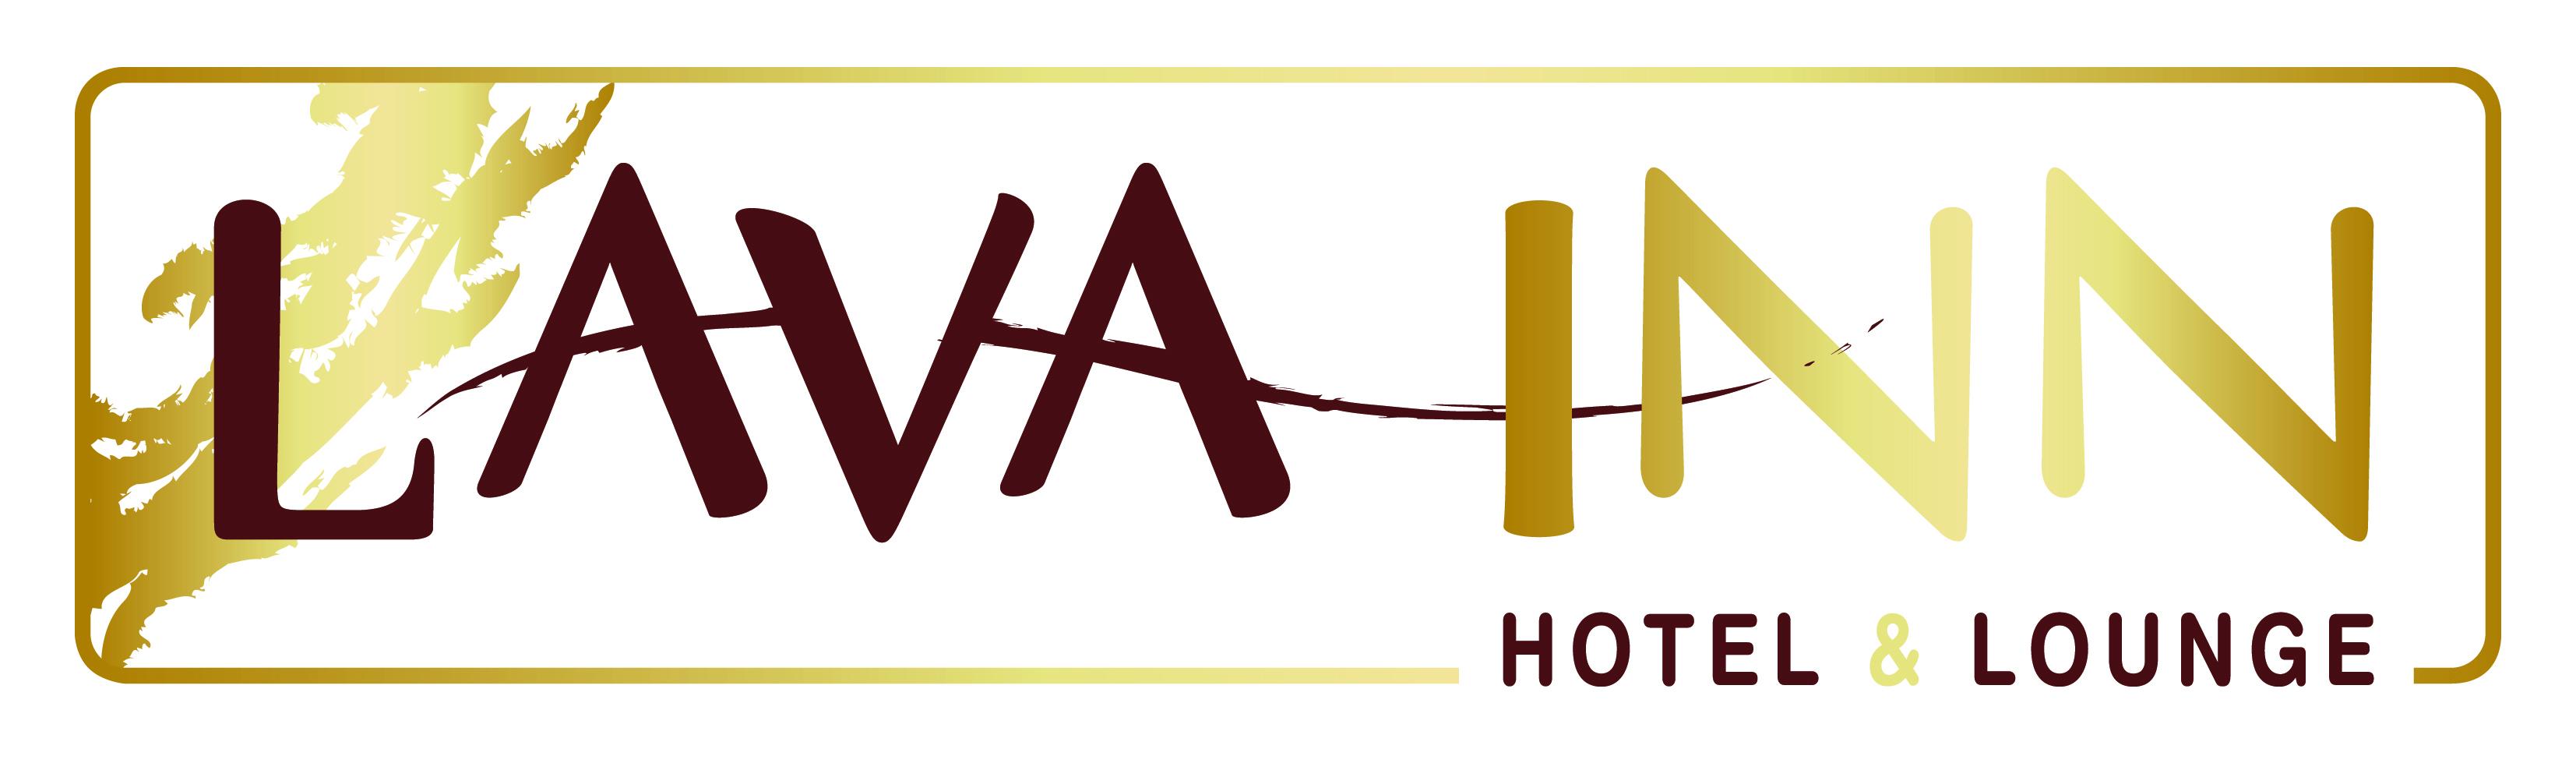 Lava Inn